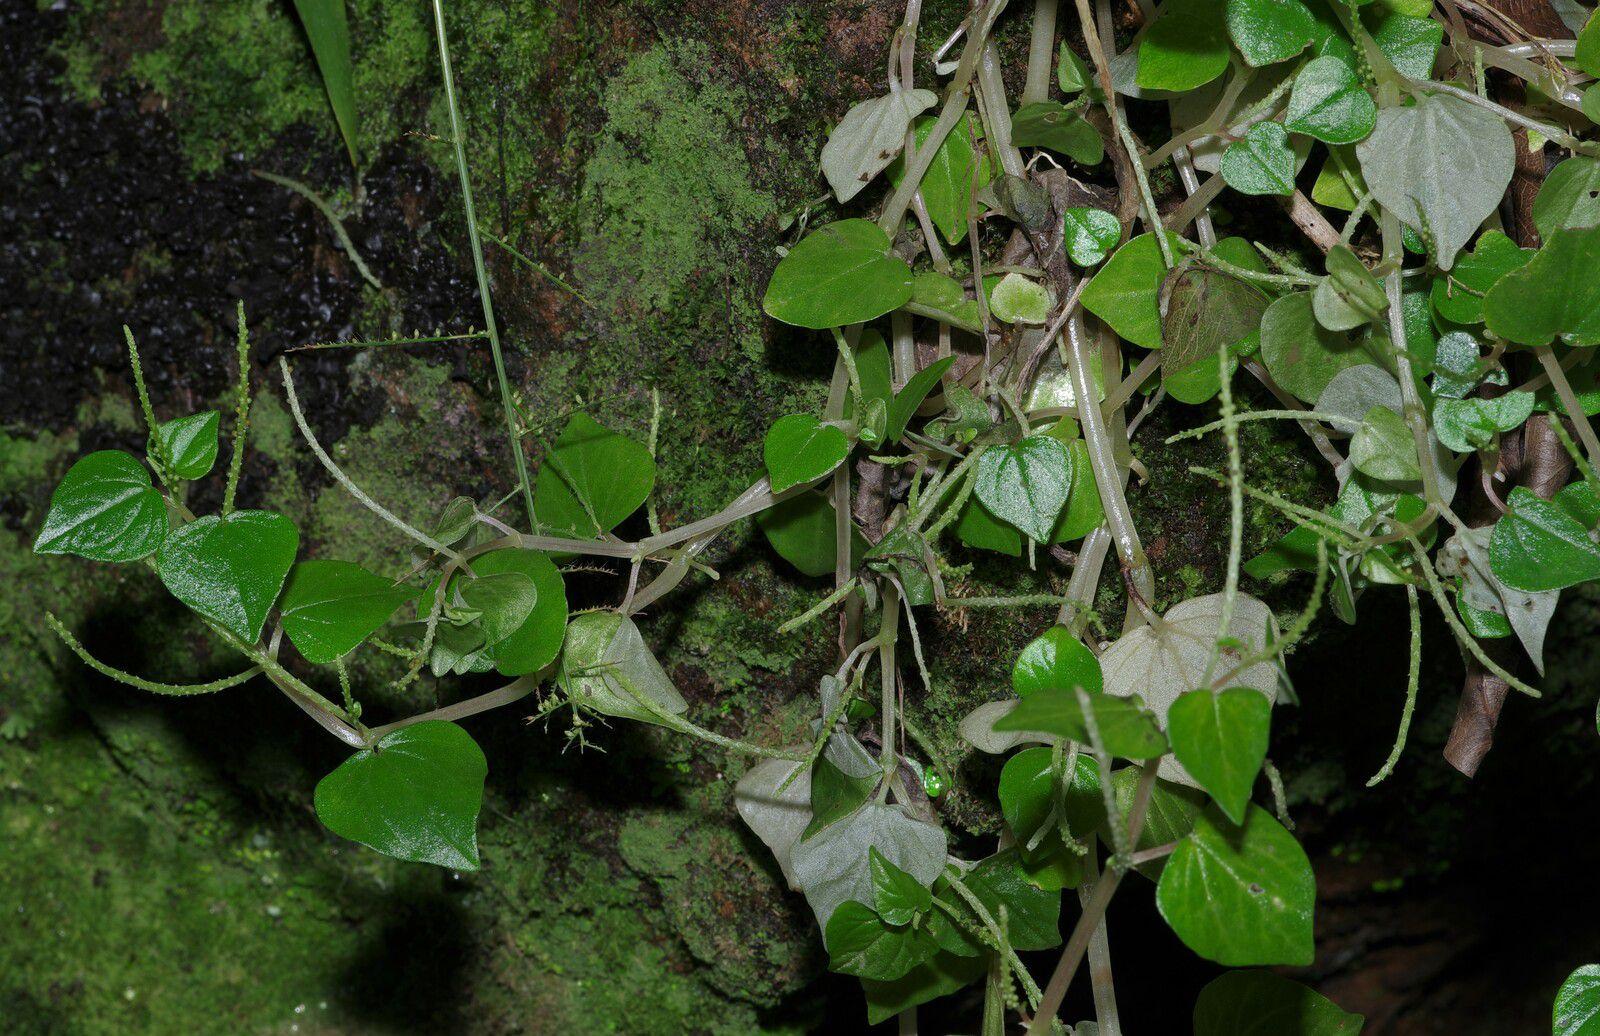 Peperomia pellucida (salade soldat, salad soda)